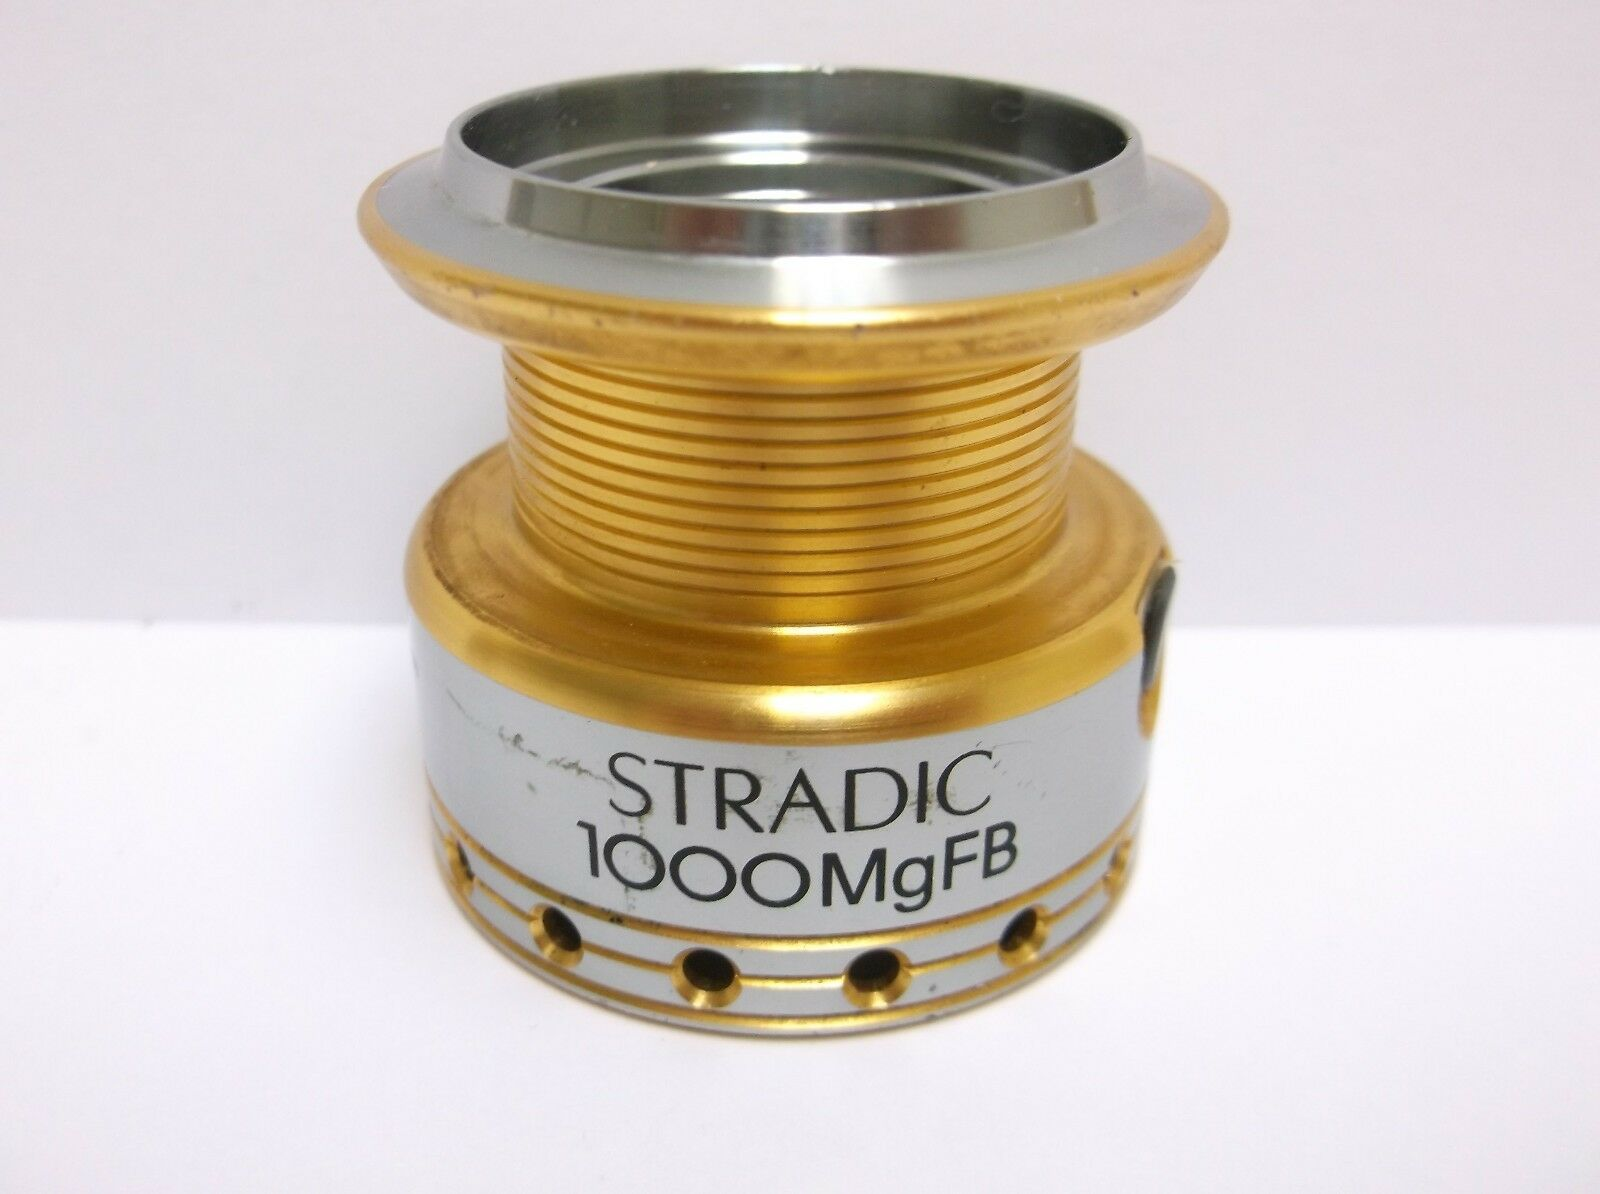 USED SHIMANO SPINNING REEL PART - Stradic 1000 MgFB - Spool  A